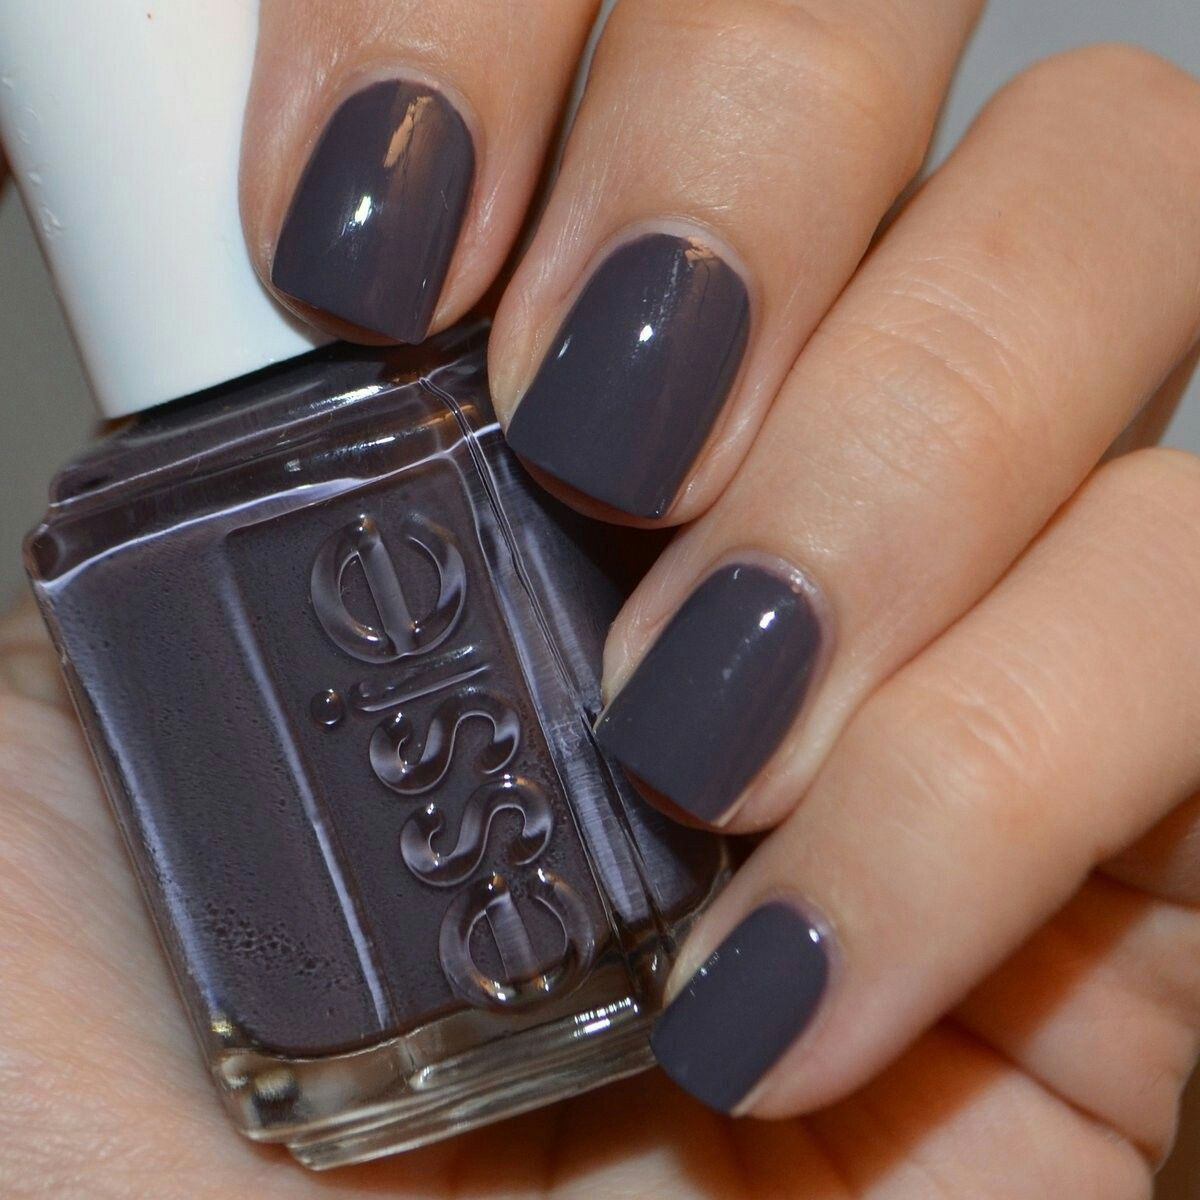 Essie - Winning Streak | NAILS | Pinterest | Makeup, Manicure and ...